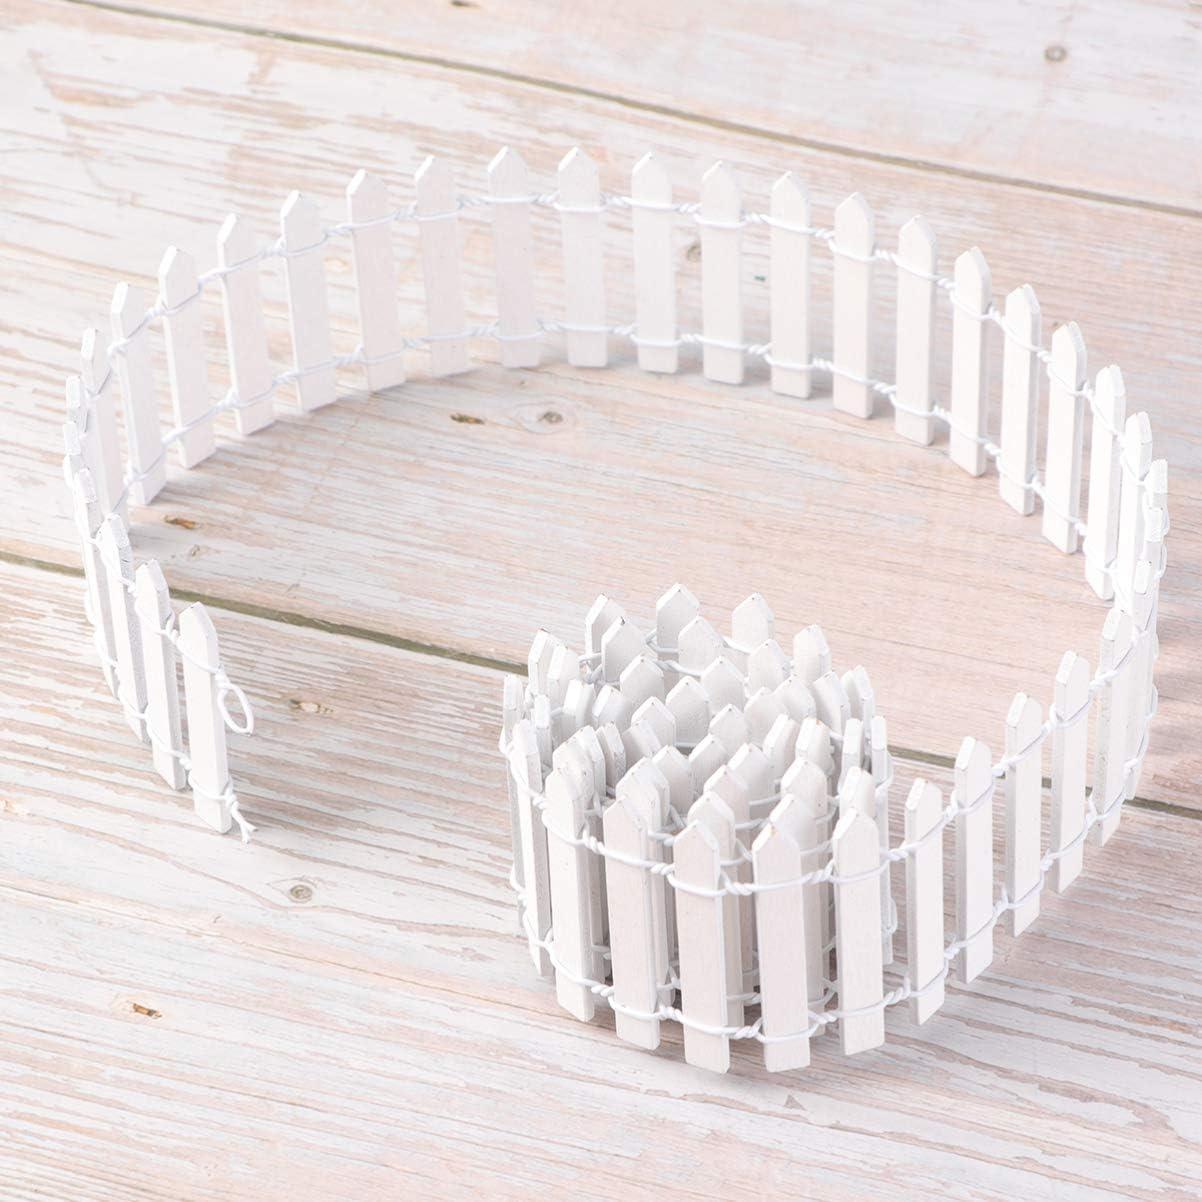 DOITOOL 100cm Miniature Fairy Garden Fence Wooden Dollhouse Decorative Picket Fence for DIY Crafts Project Terrarium Bonsai Miniature